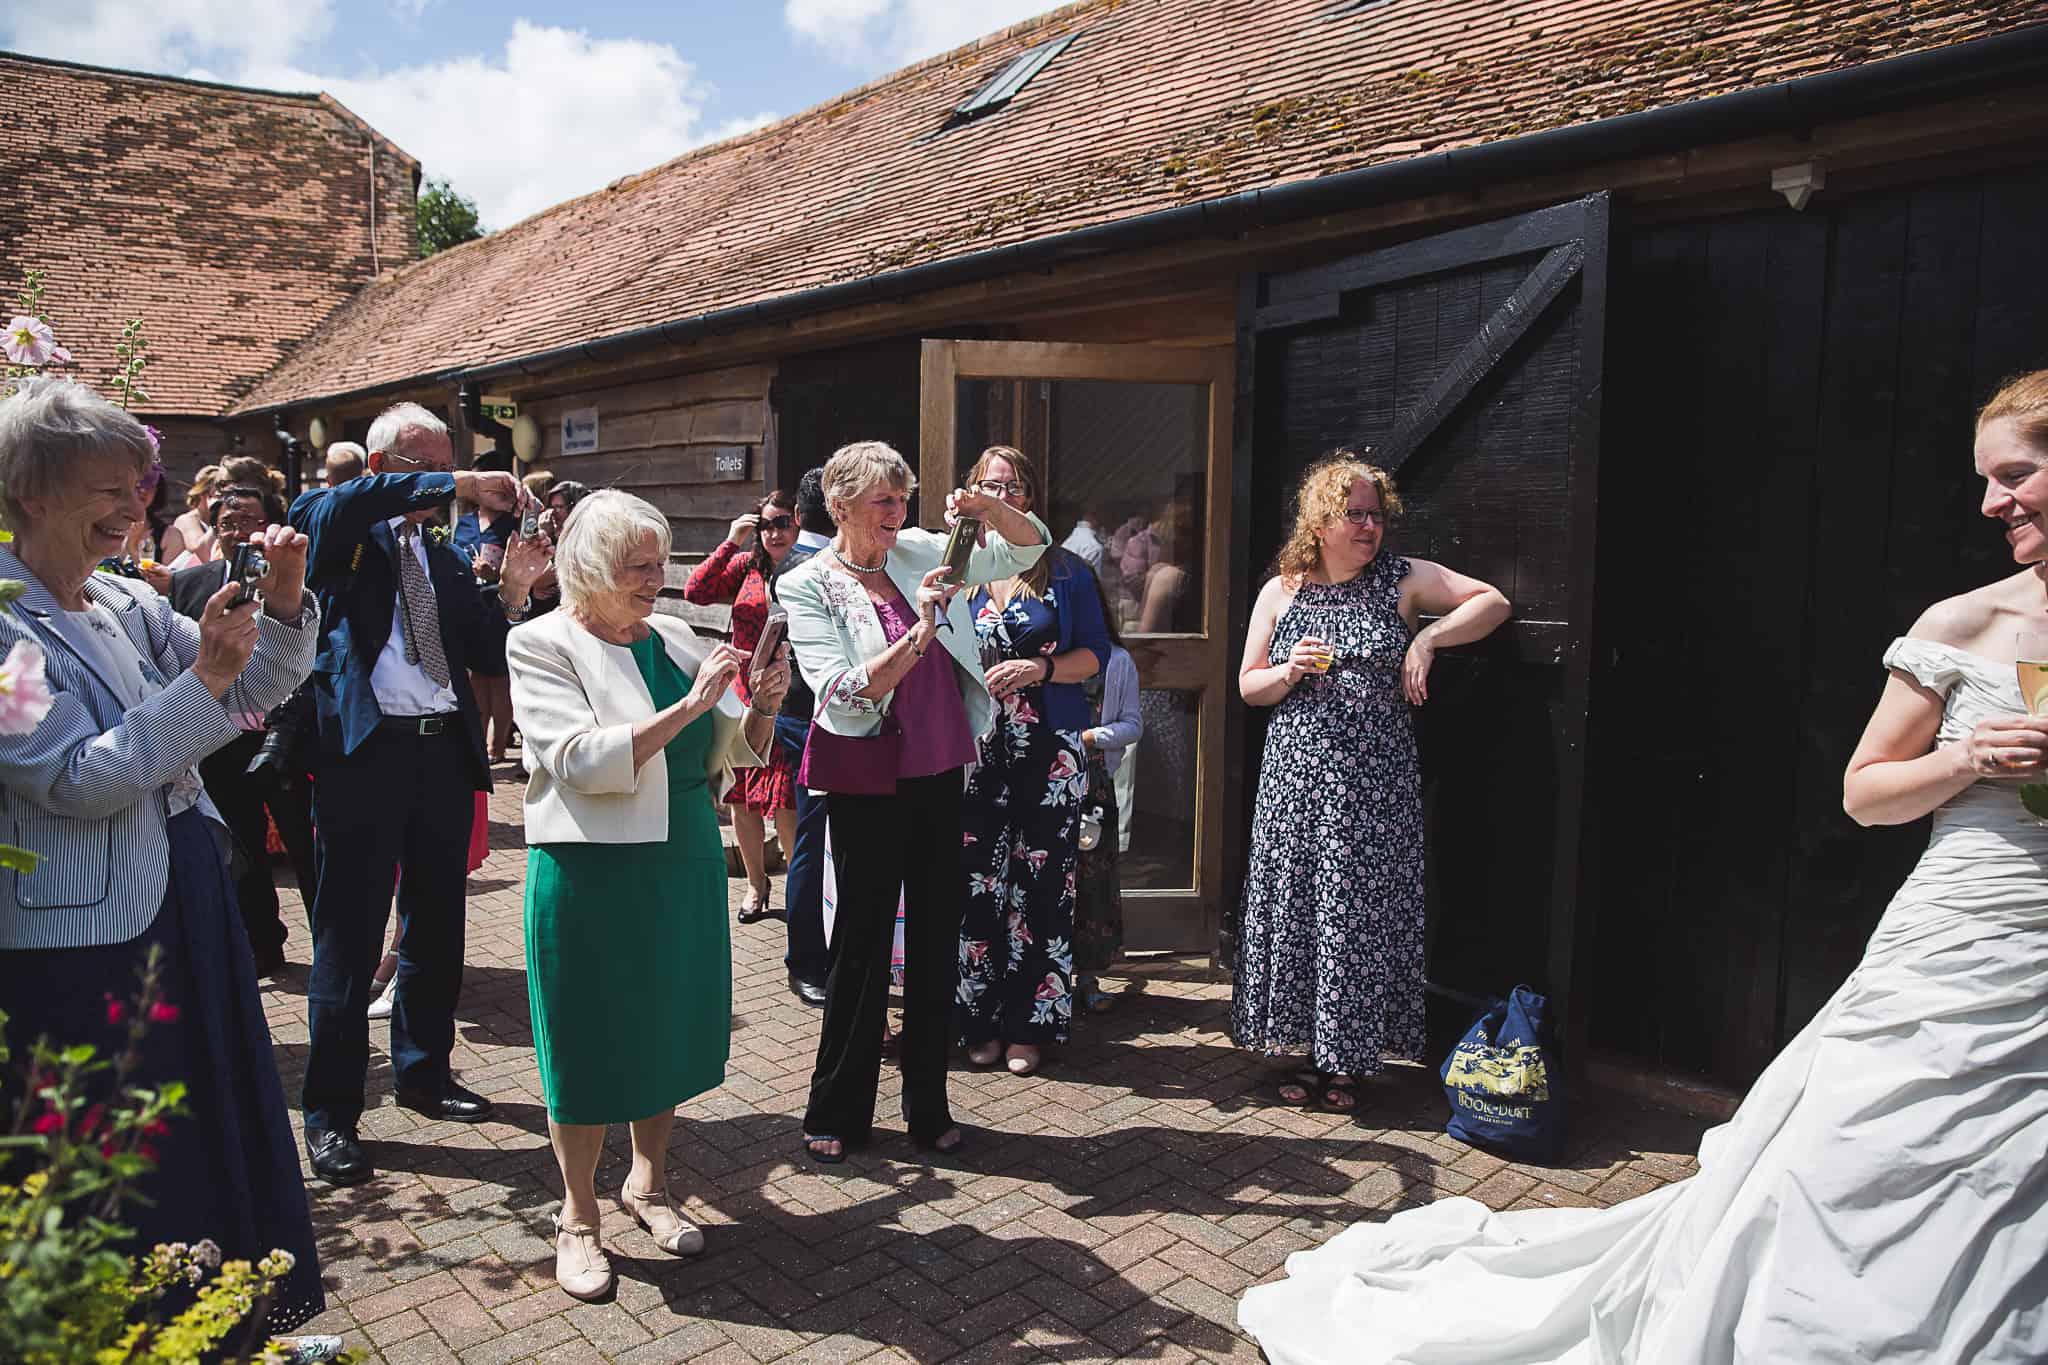 Vicky Pete Wedding Earth Trust Fison Barn katie mortimore photography oxfordshire abingdon